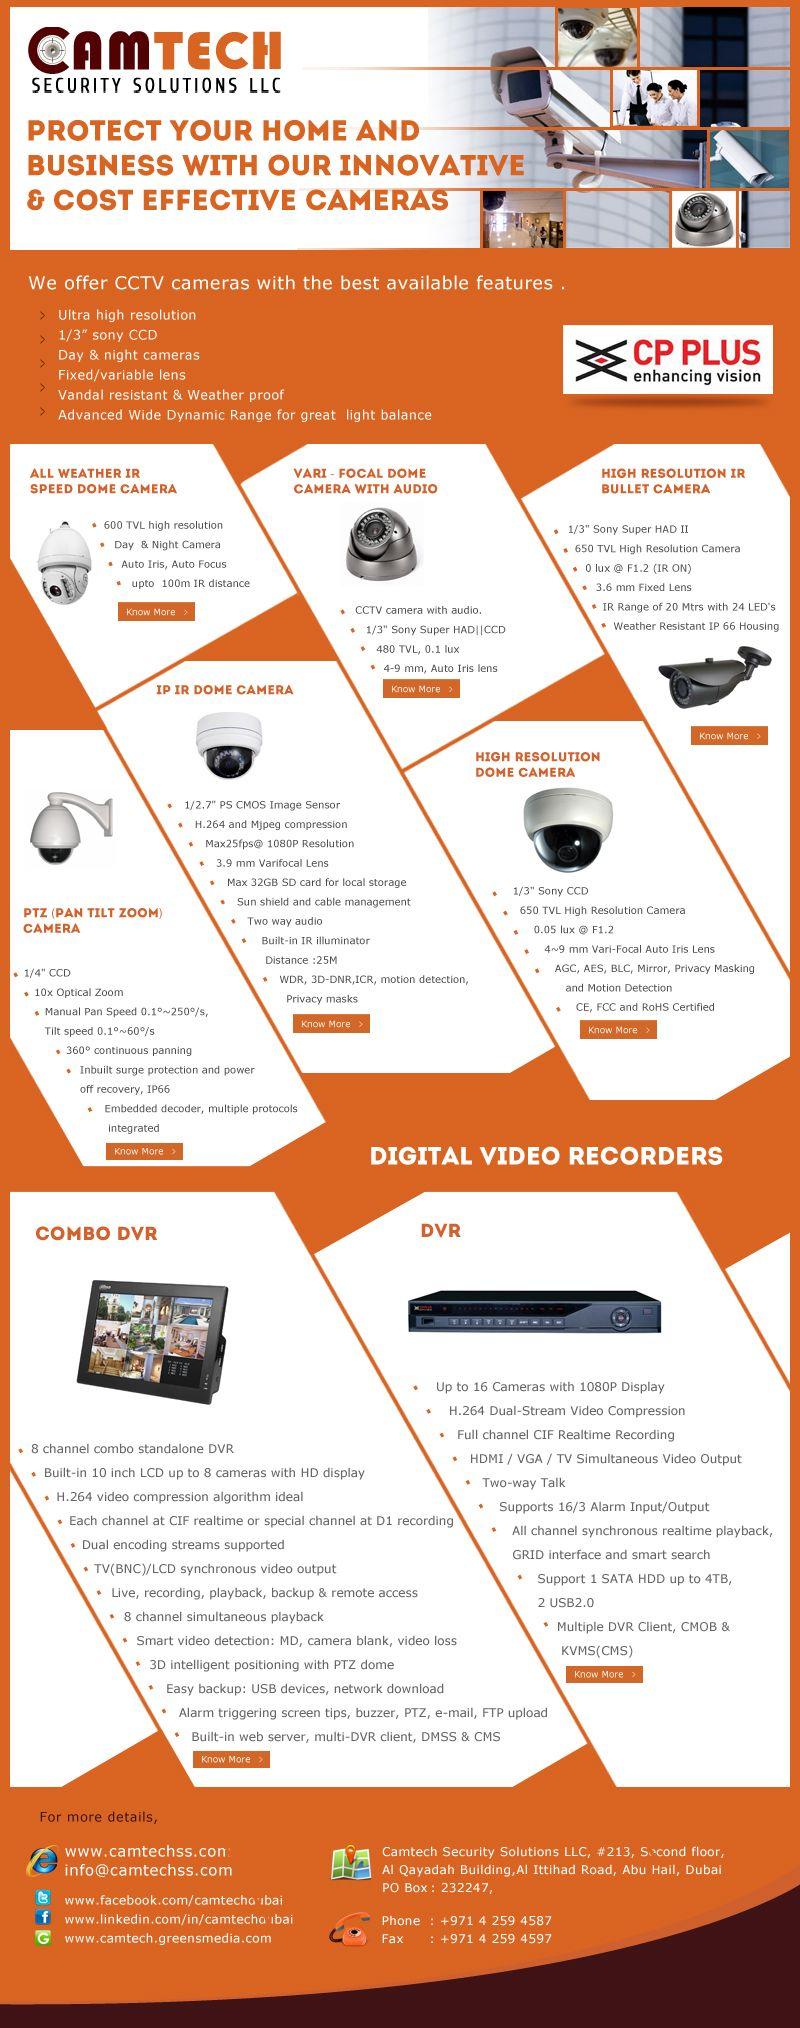 Camtech Security Solutions CCTV Flyer | CCTV Camera | Pinterest ...